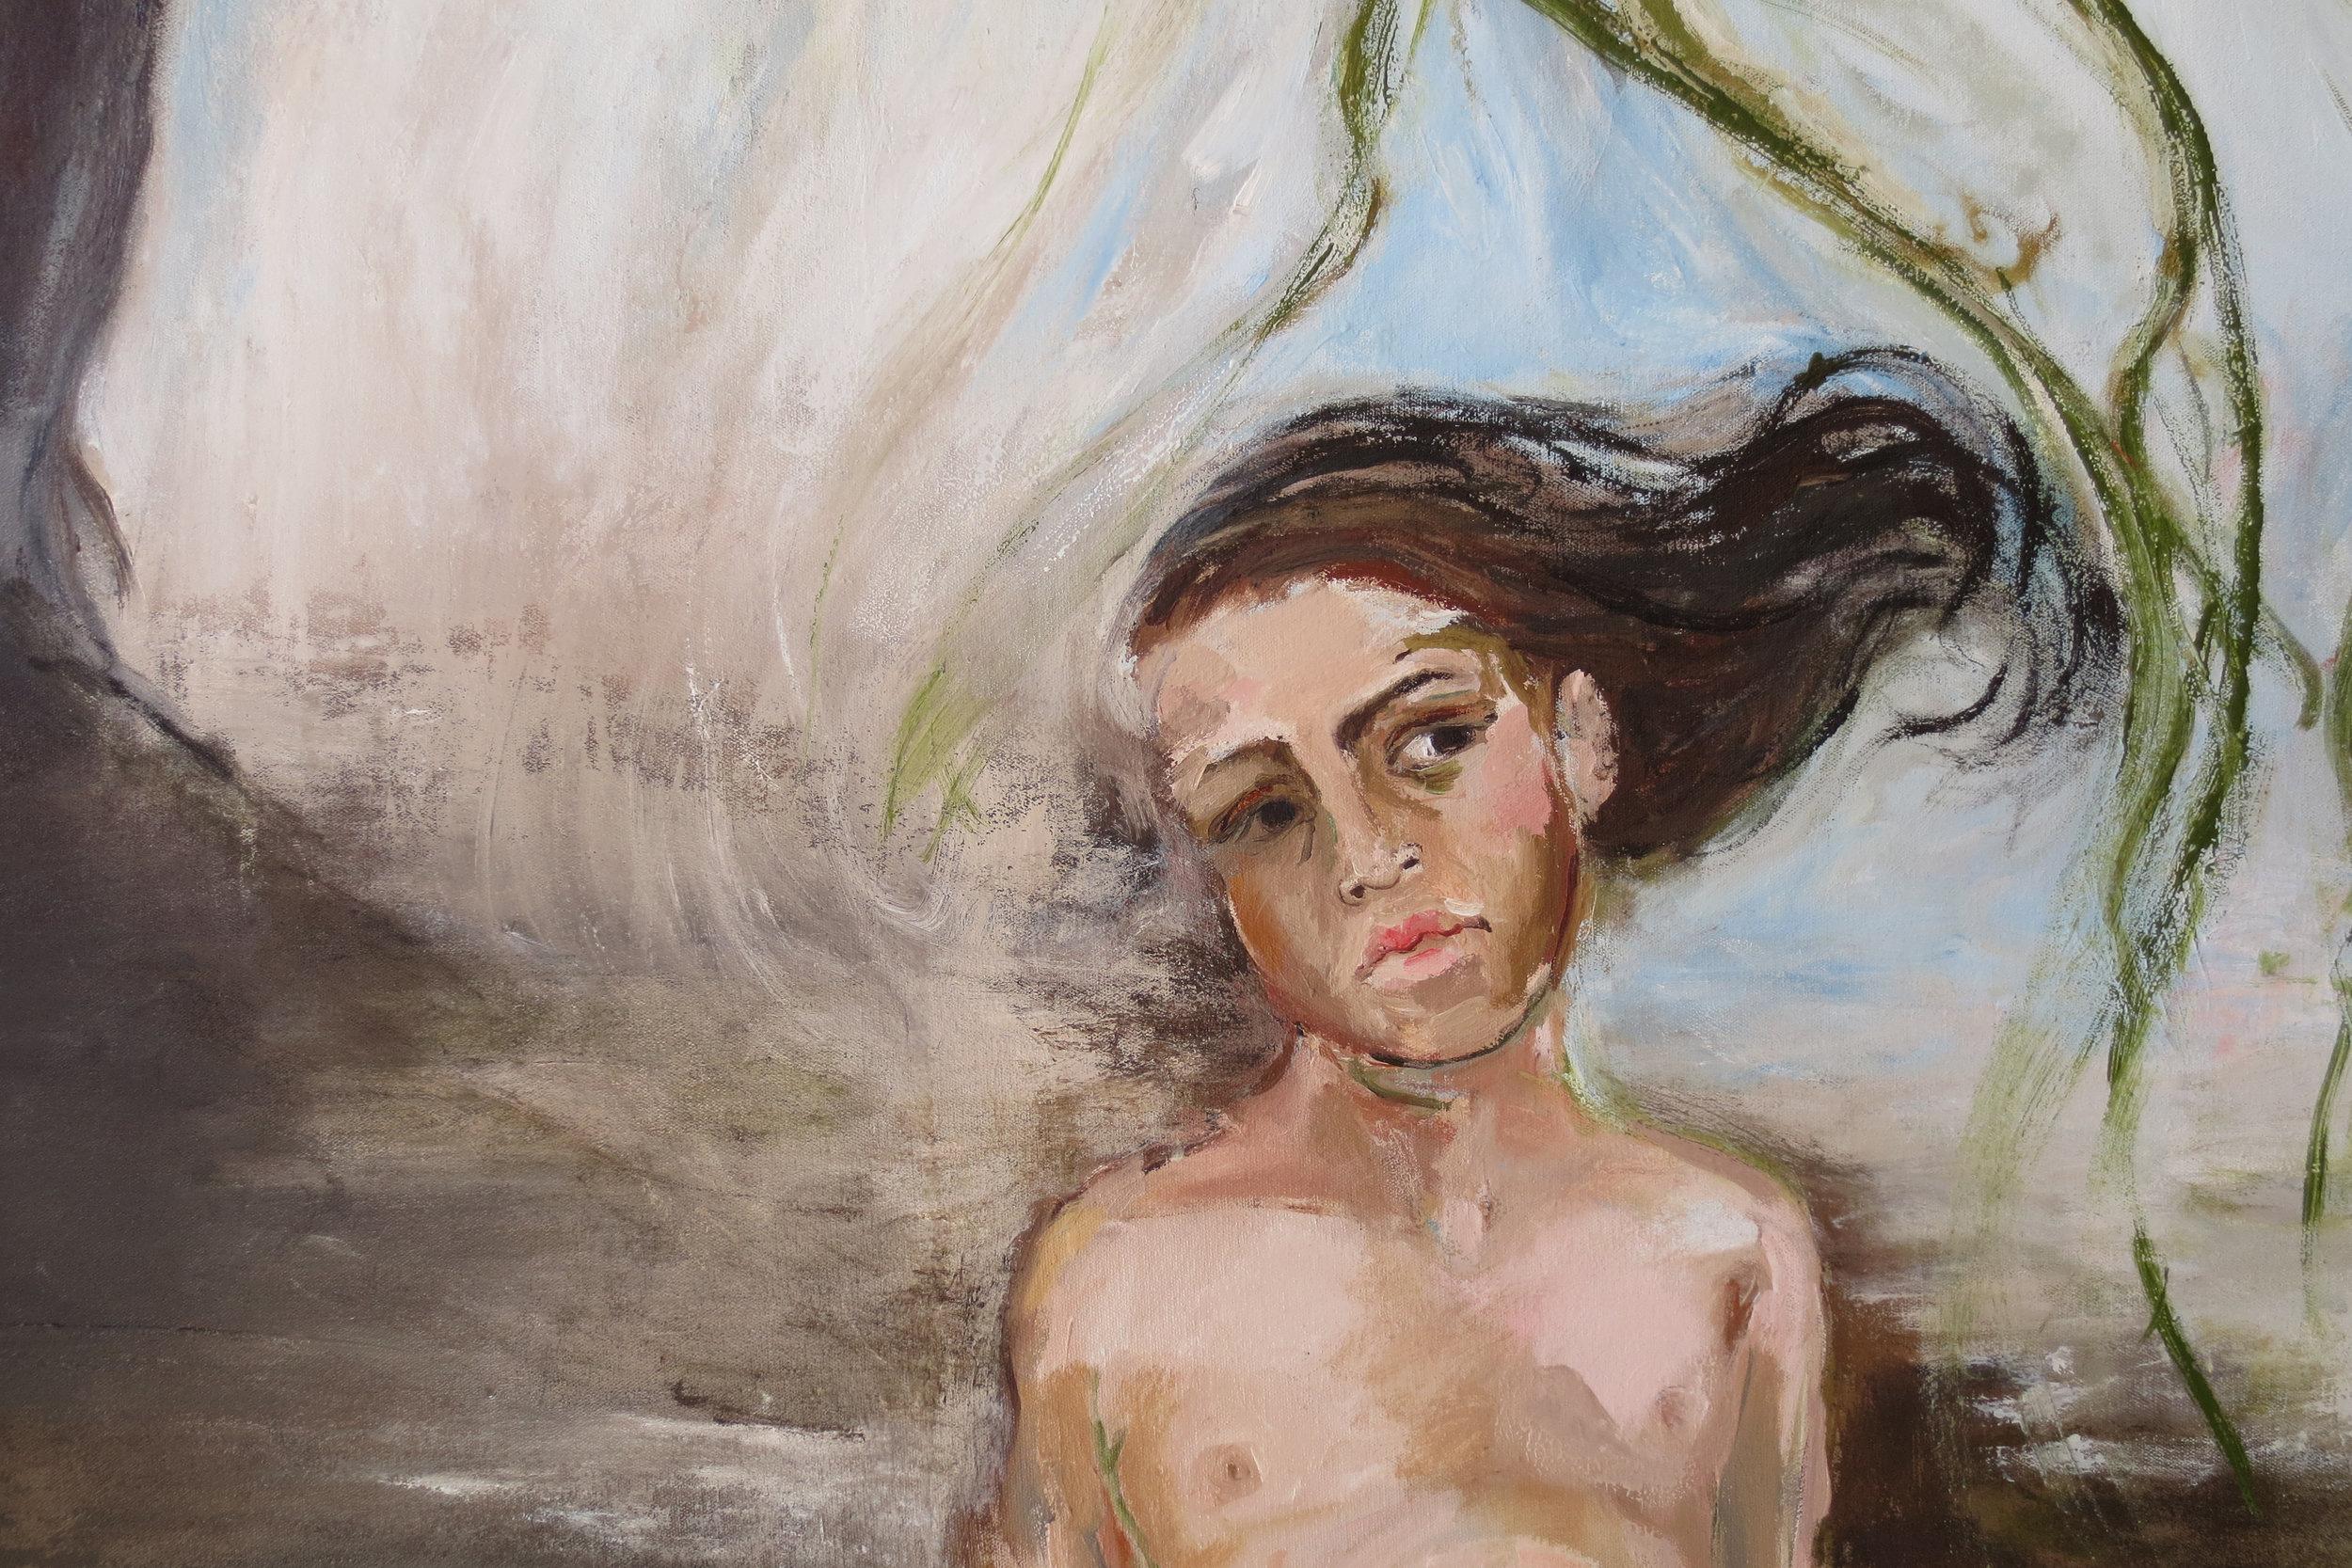 El Bosque (detail), 2014, Oil on canvas, 76 x 67 in.